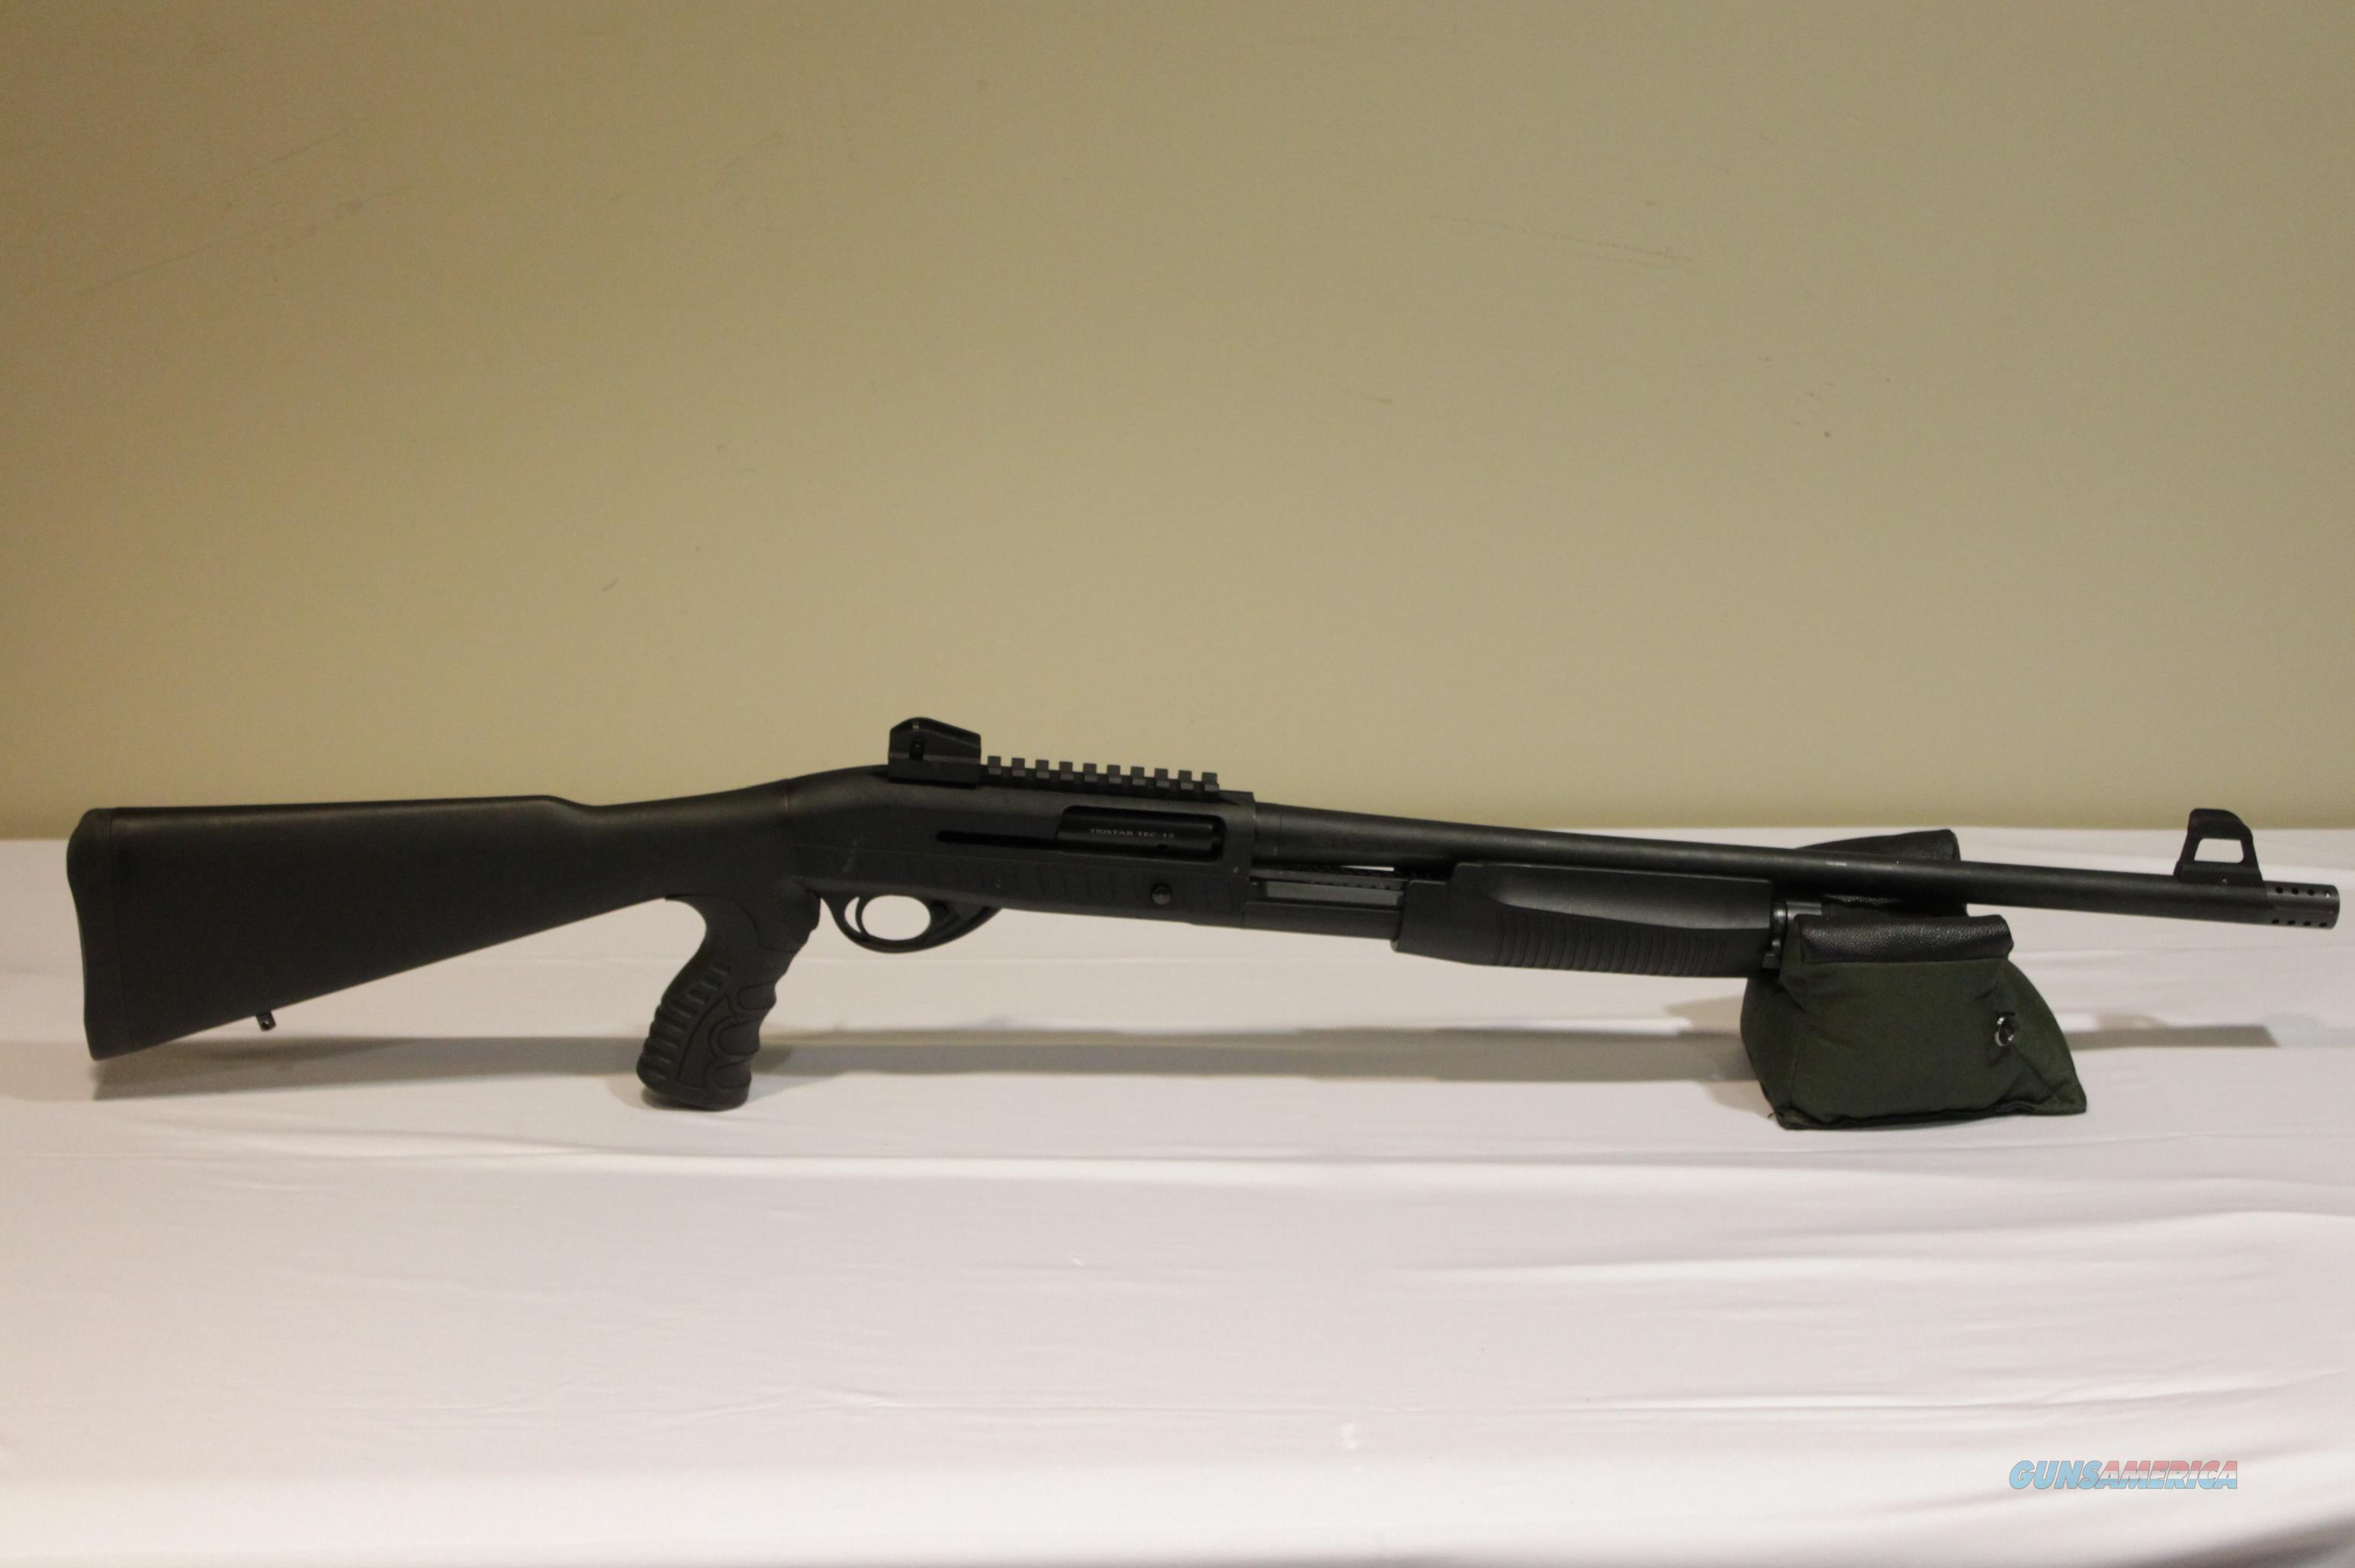 "TriStar 25120 TEC-12 Auto/Pump 12 Gauge 20"" 3"" 5+1 Synthetic w/ Pistol Grip Black  Guns > Shotguns > Tristar Shotguns"